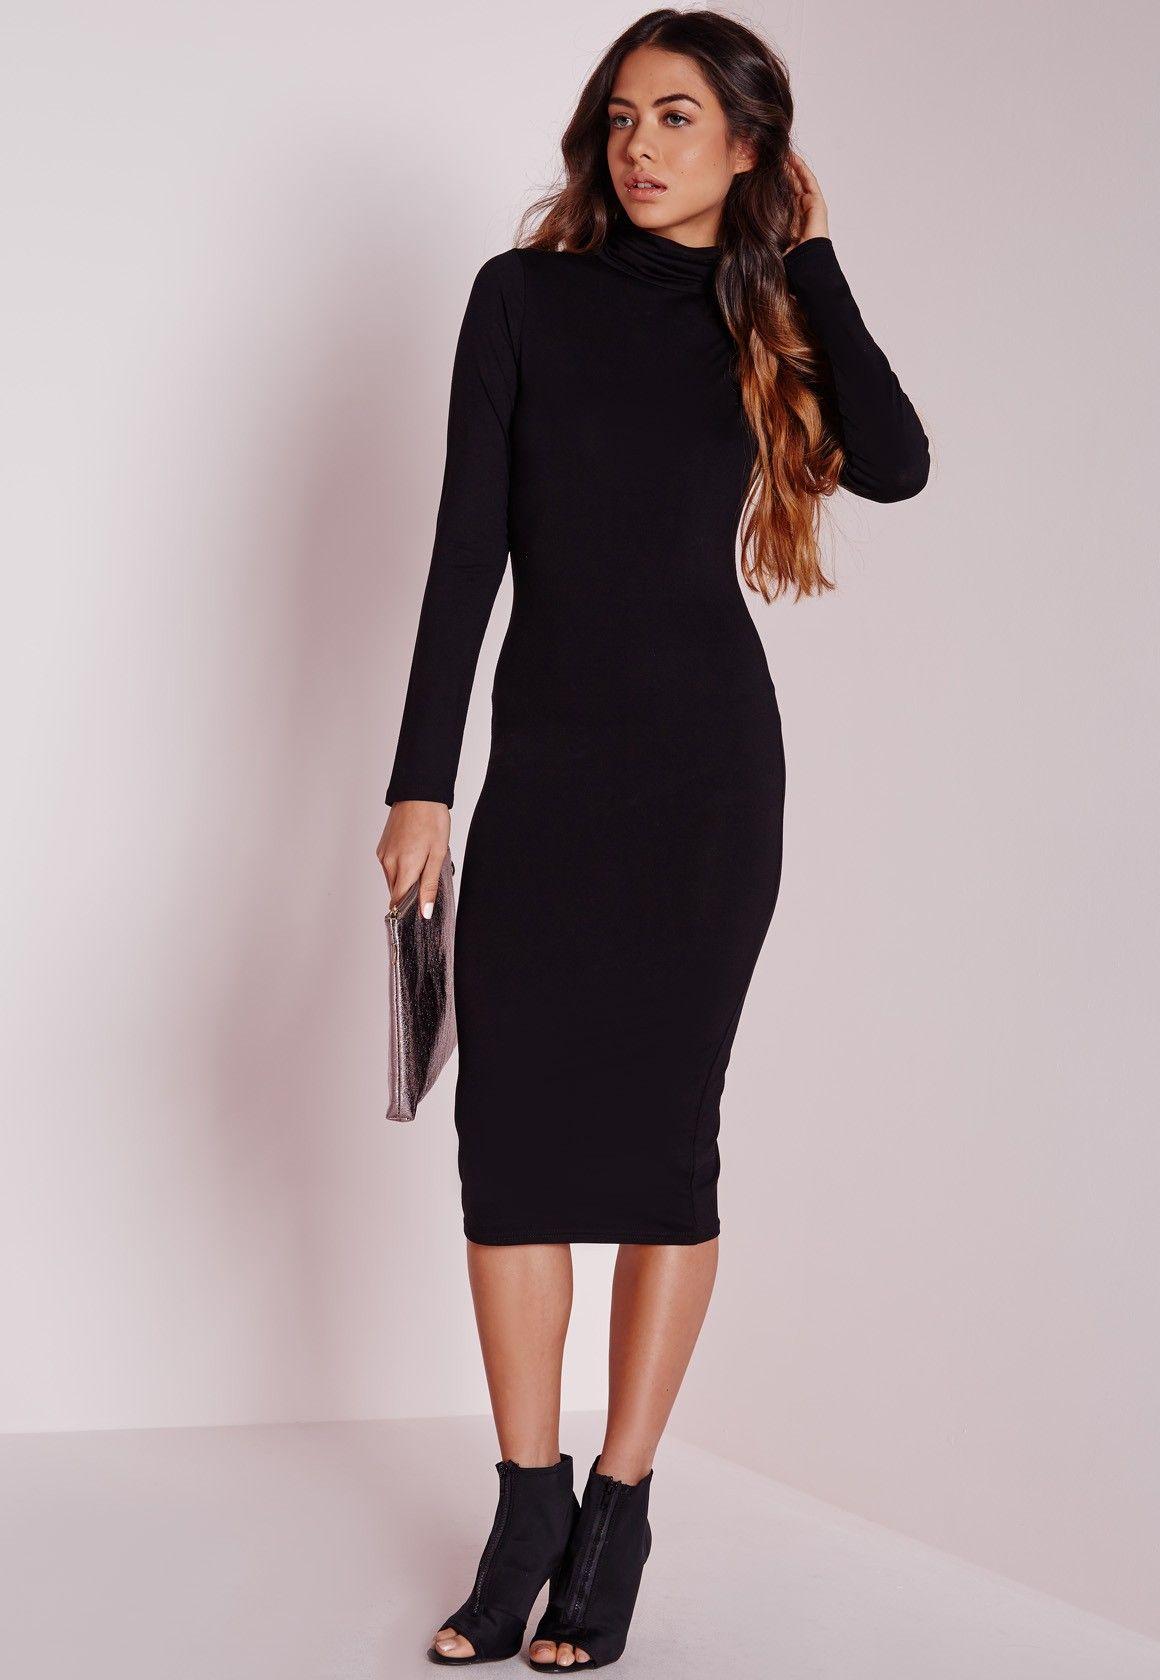 41433e0f5730 Missguided - Long Sleeve Roll Neck Jersey Midi Dress Black ...